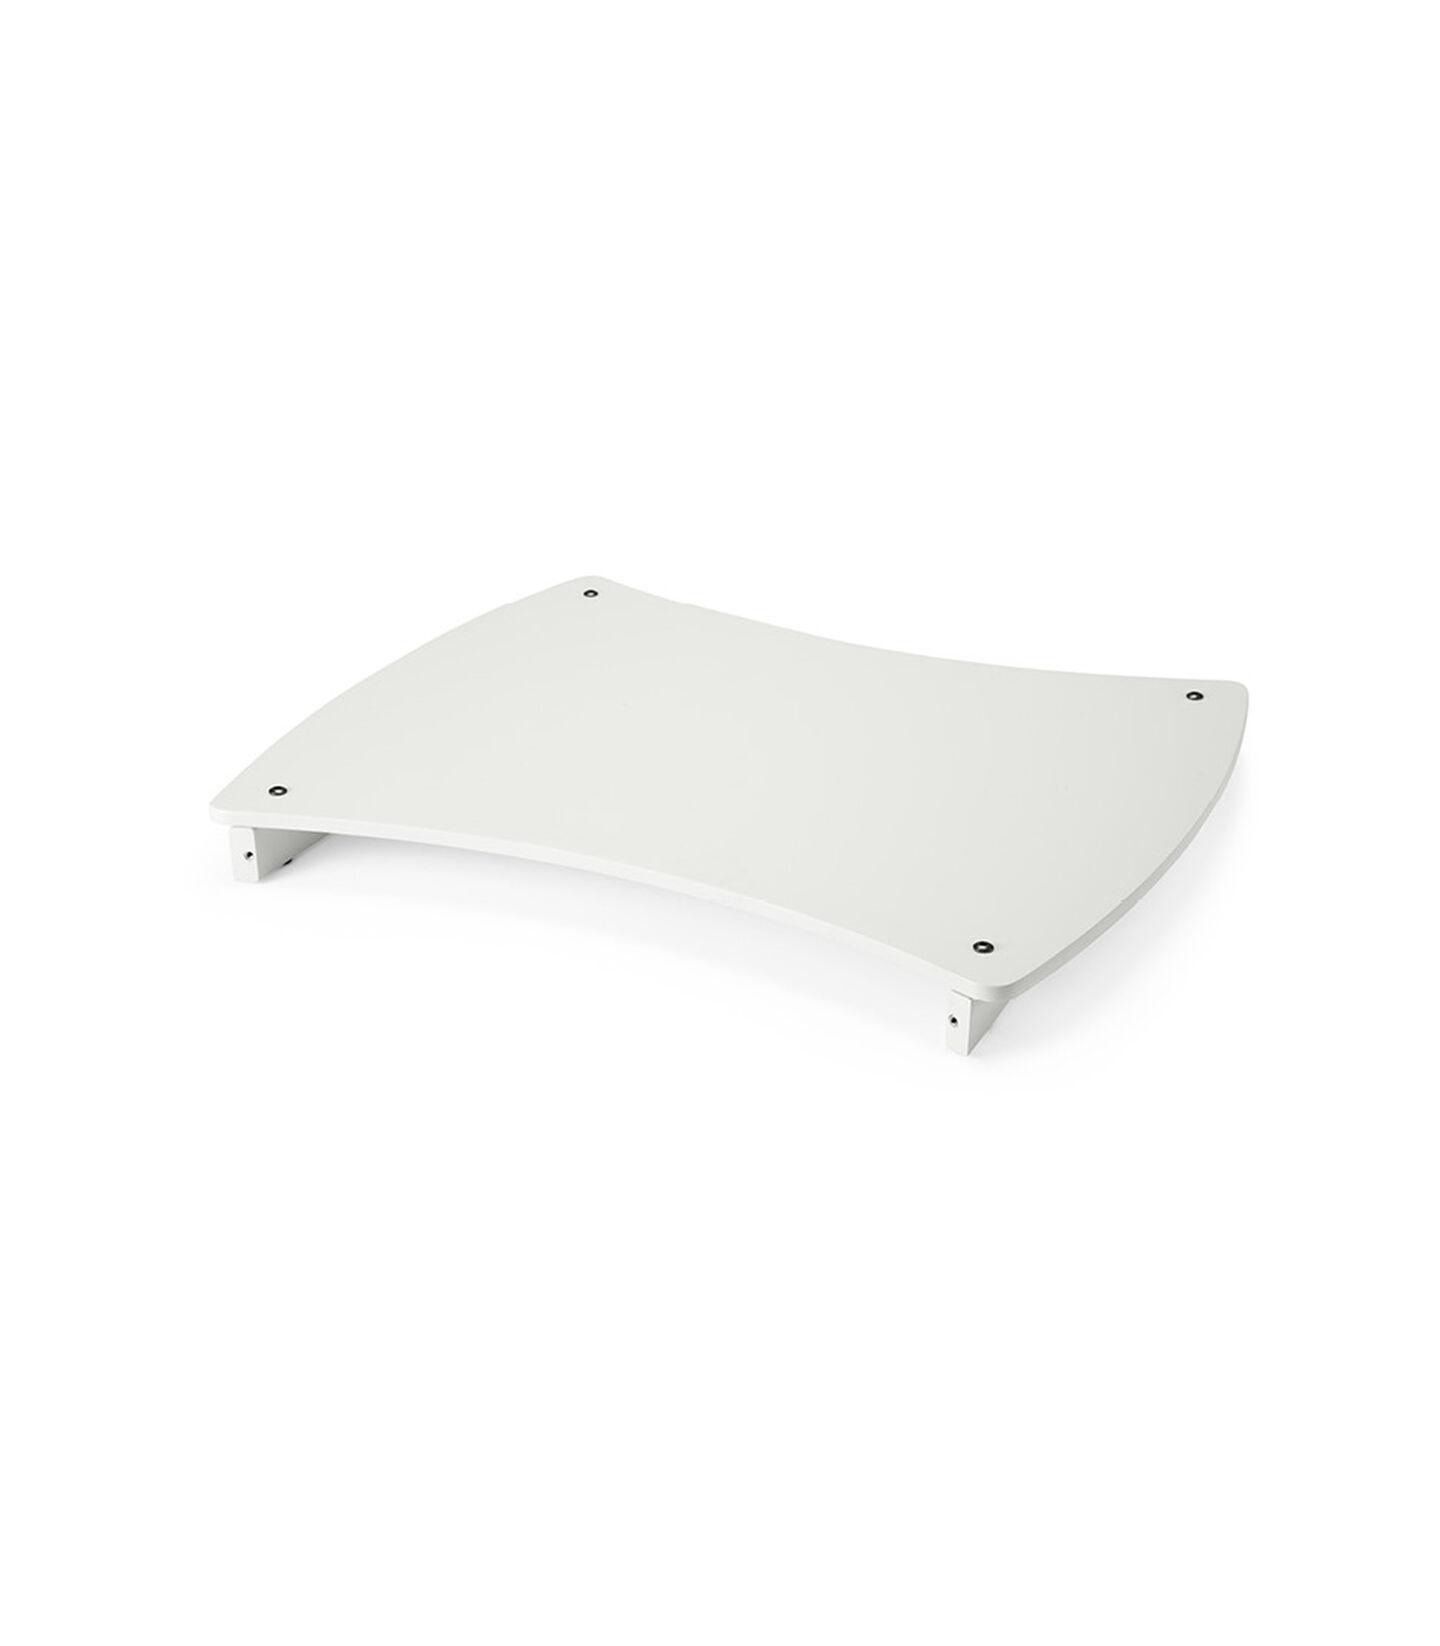 Stokke® Care™ Överhylla komplett White, White, mainview view 2